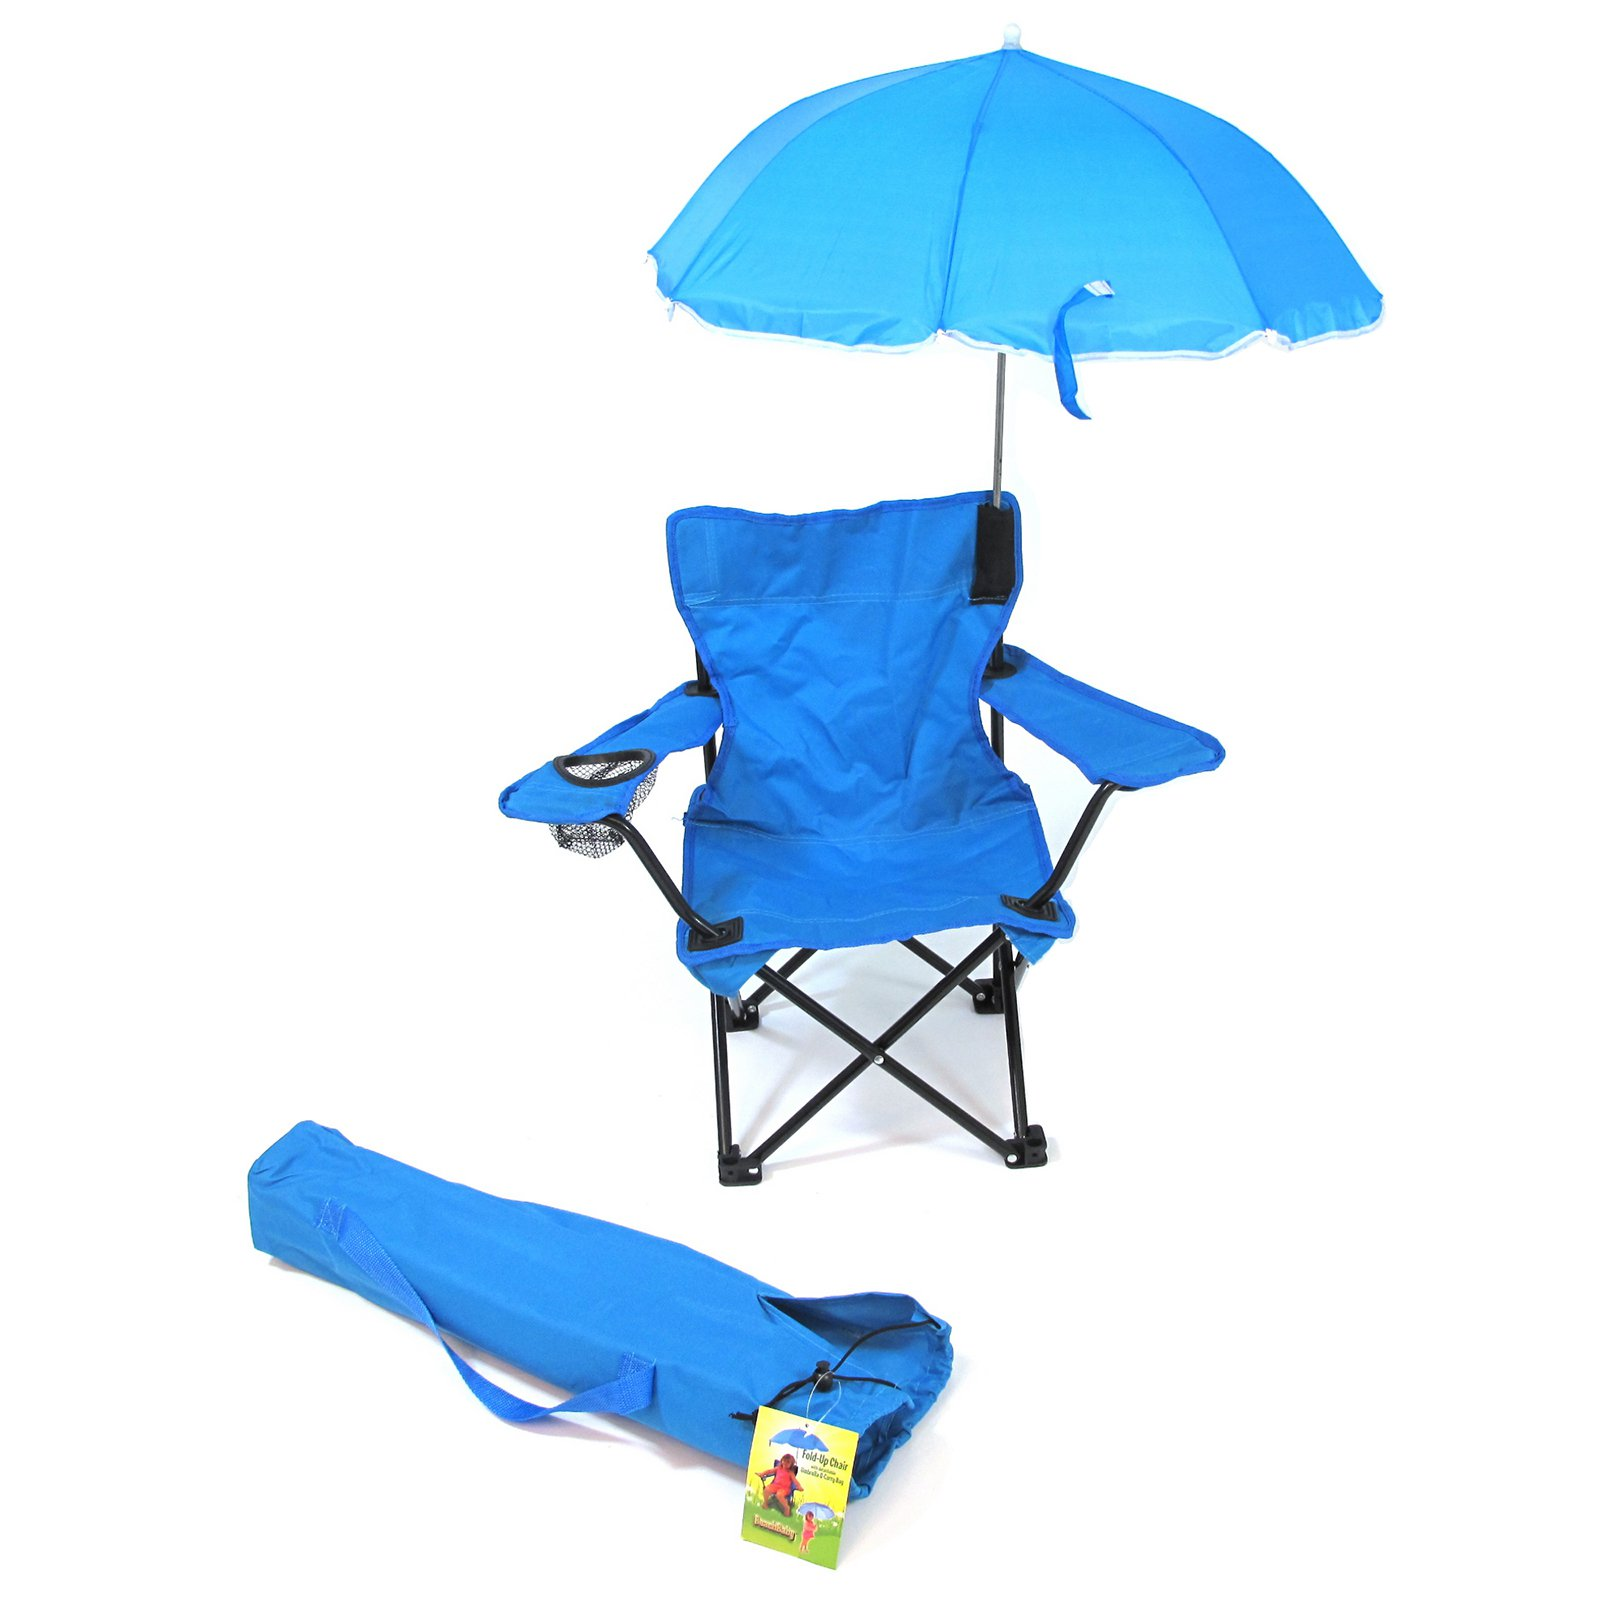 beach chairs and umbrella mini saucer chair baby all season with matching shoulder bag walmart com